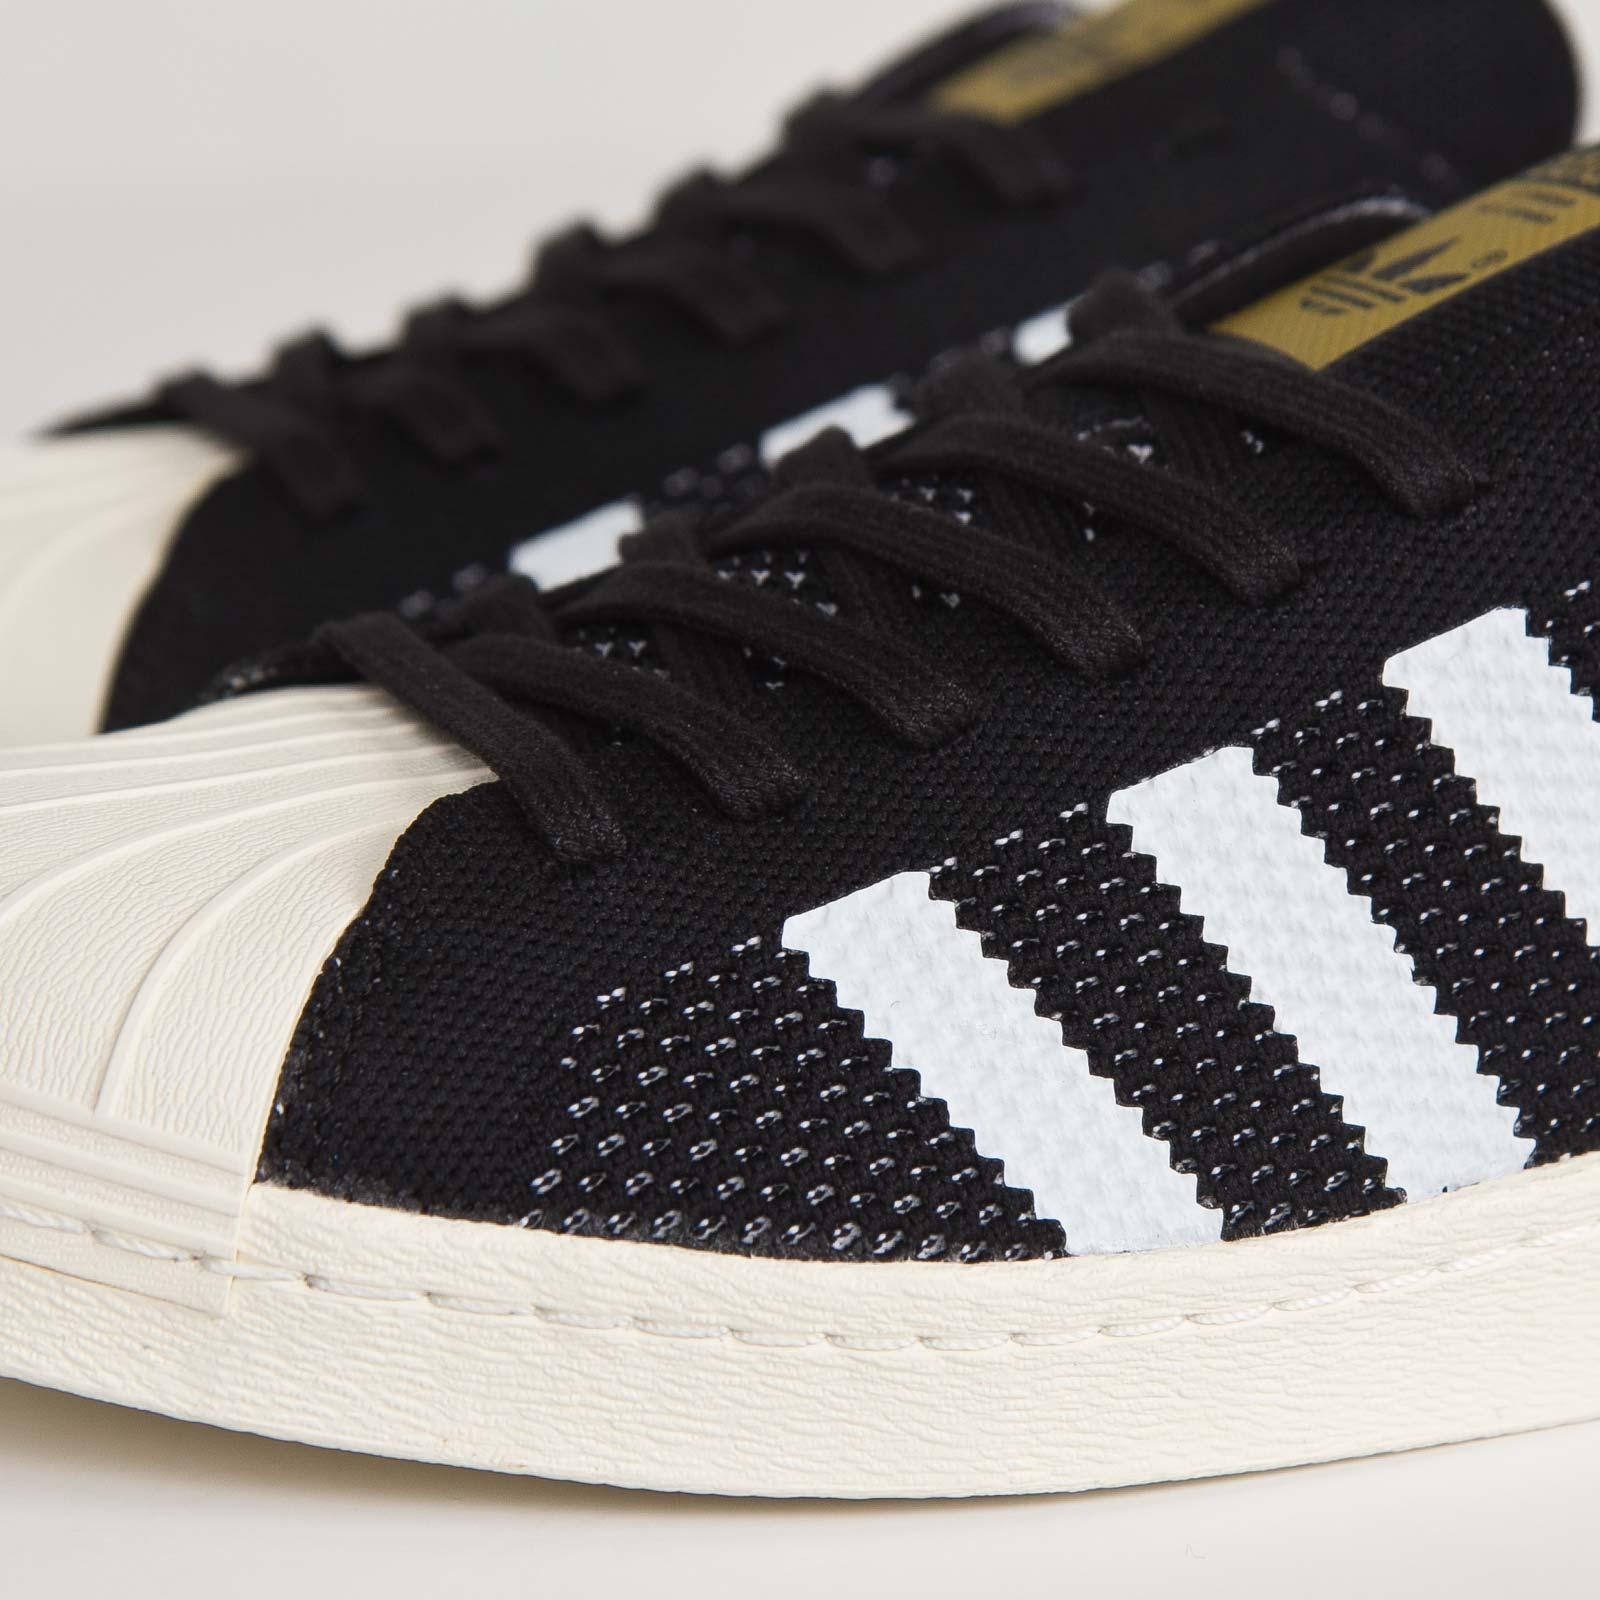 promo code a9b01 653fd adidas Superstar 80s PK - S77439 - Sneakersnstuff   sneakers ...